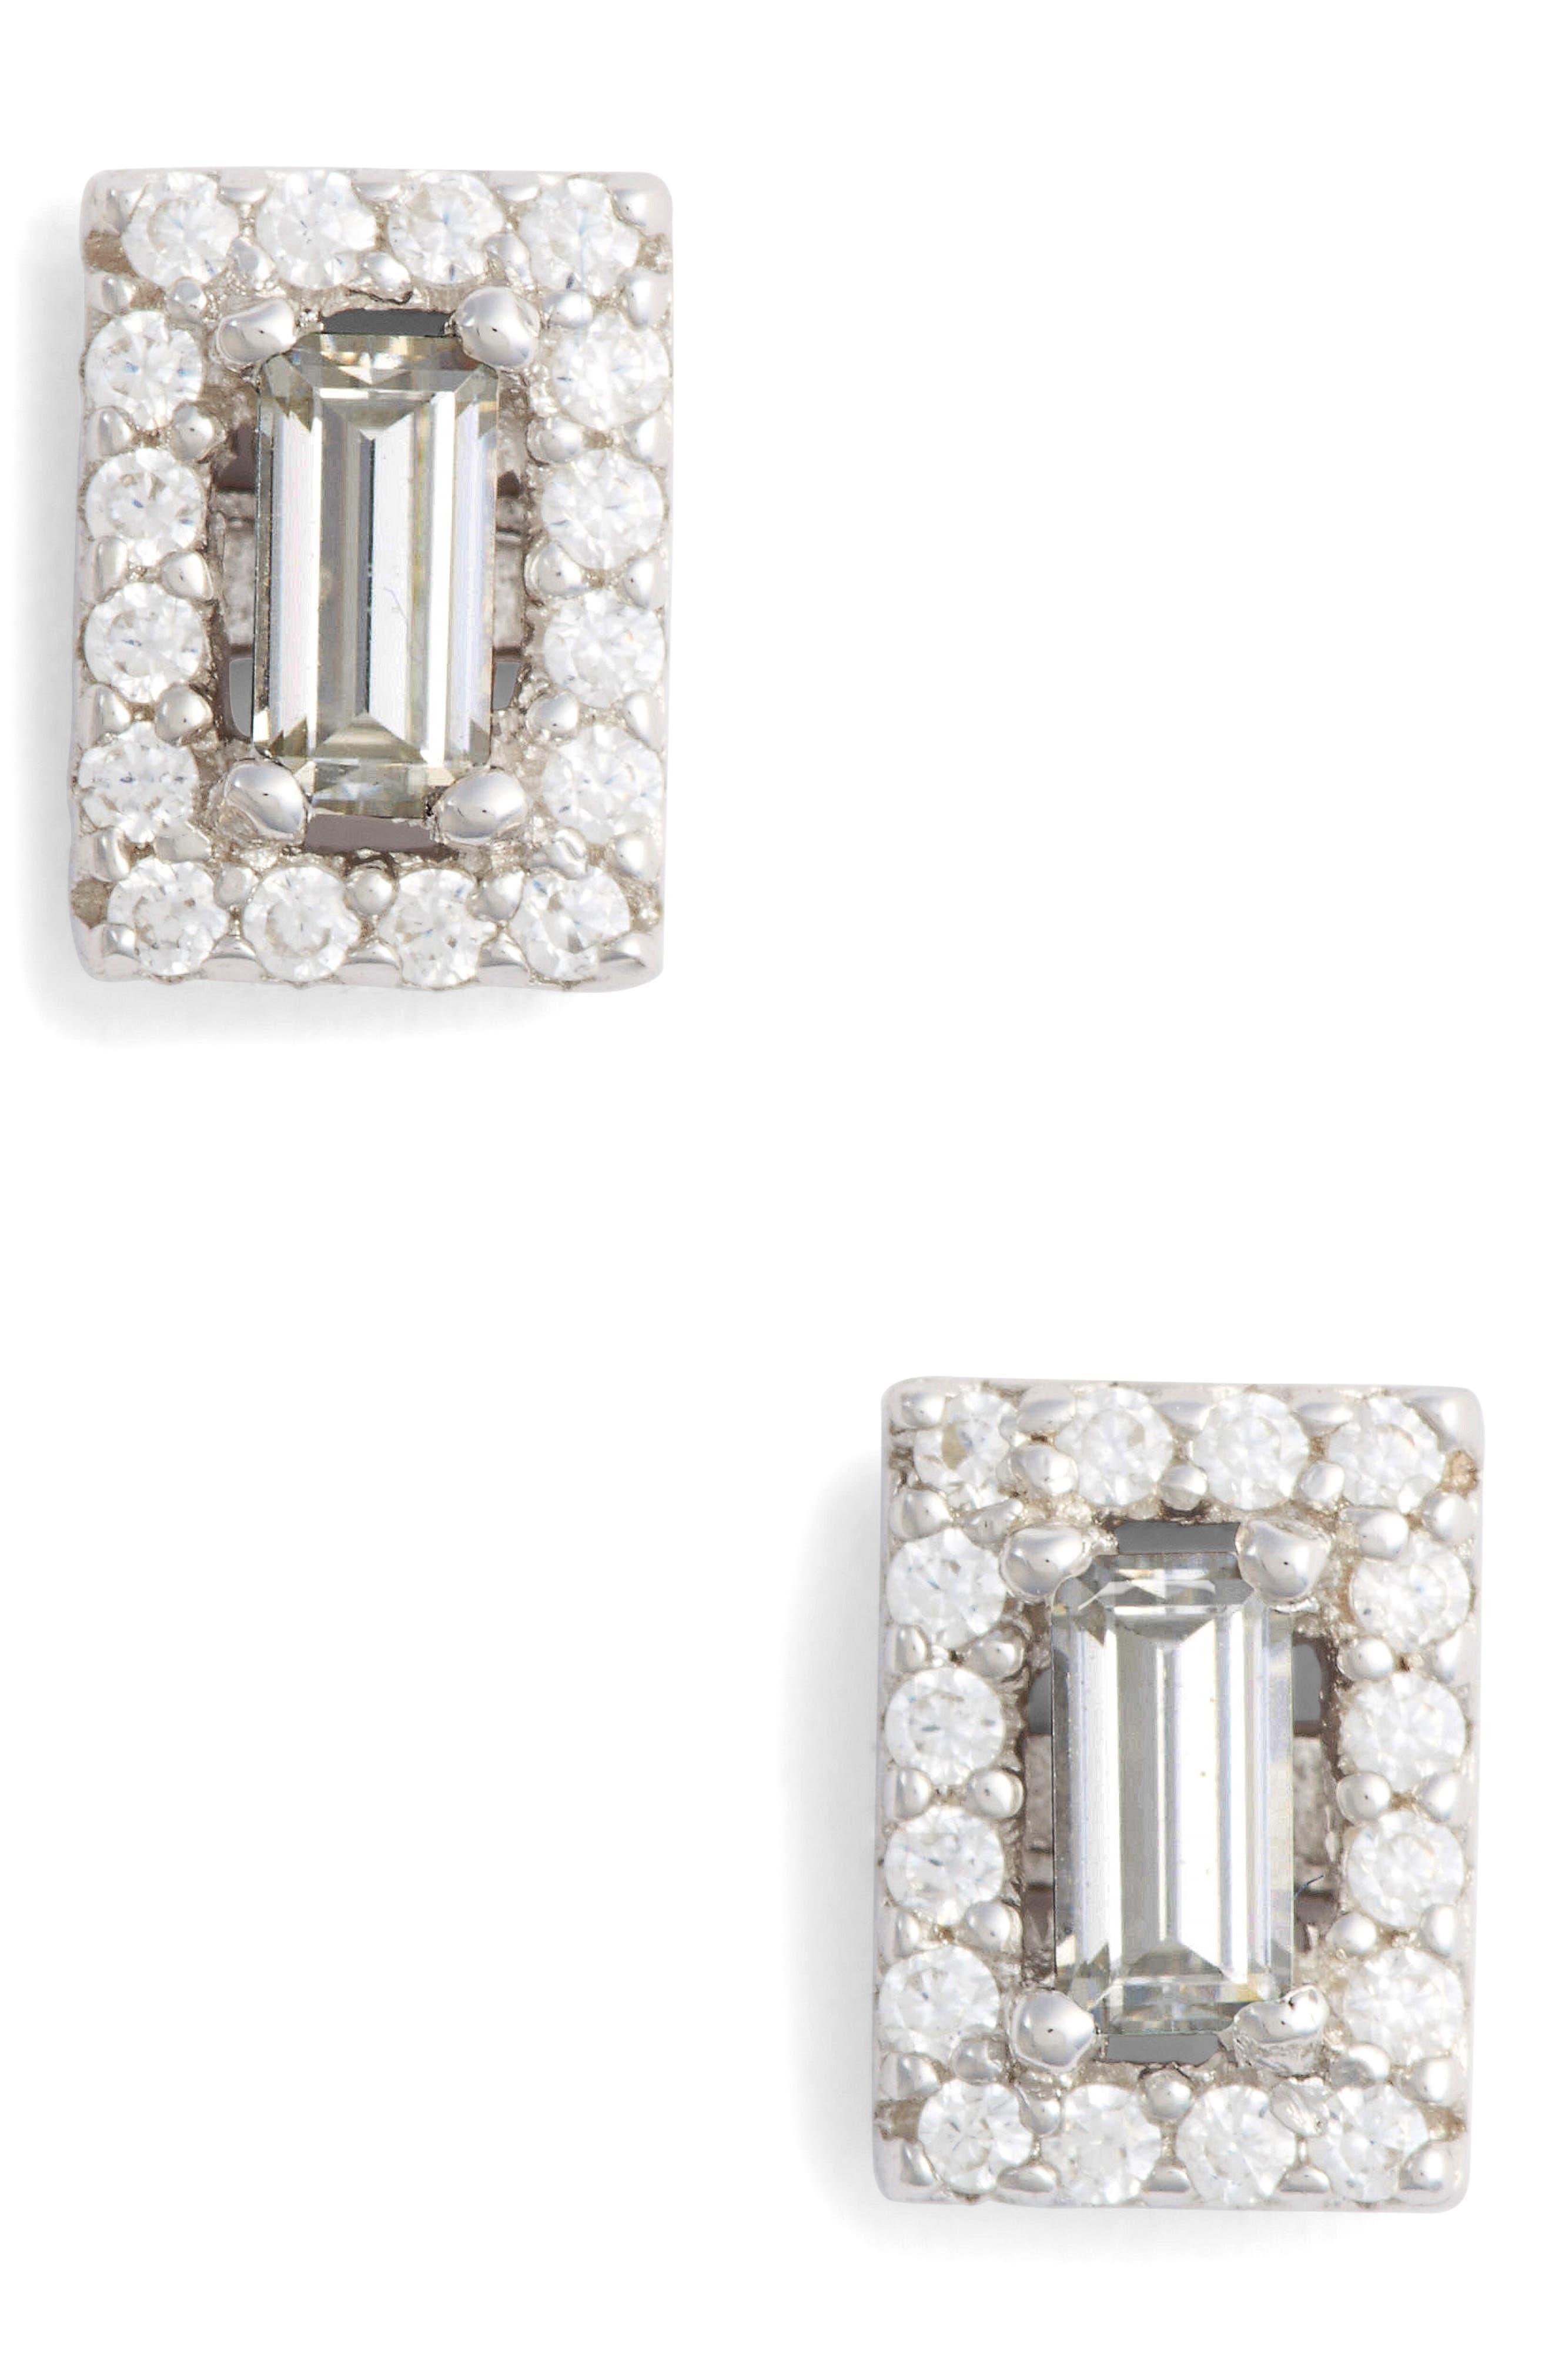 Crystal Baguette Simulated Diamond Stud Earrings,                             Main thumbnail 1, color,                             SILVER/ CLEAR